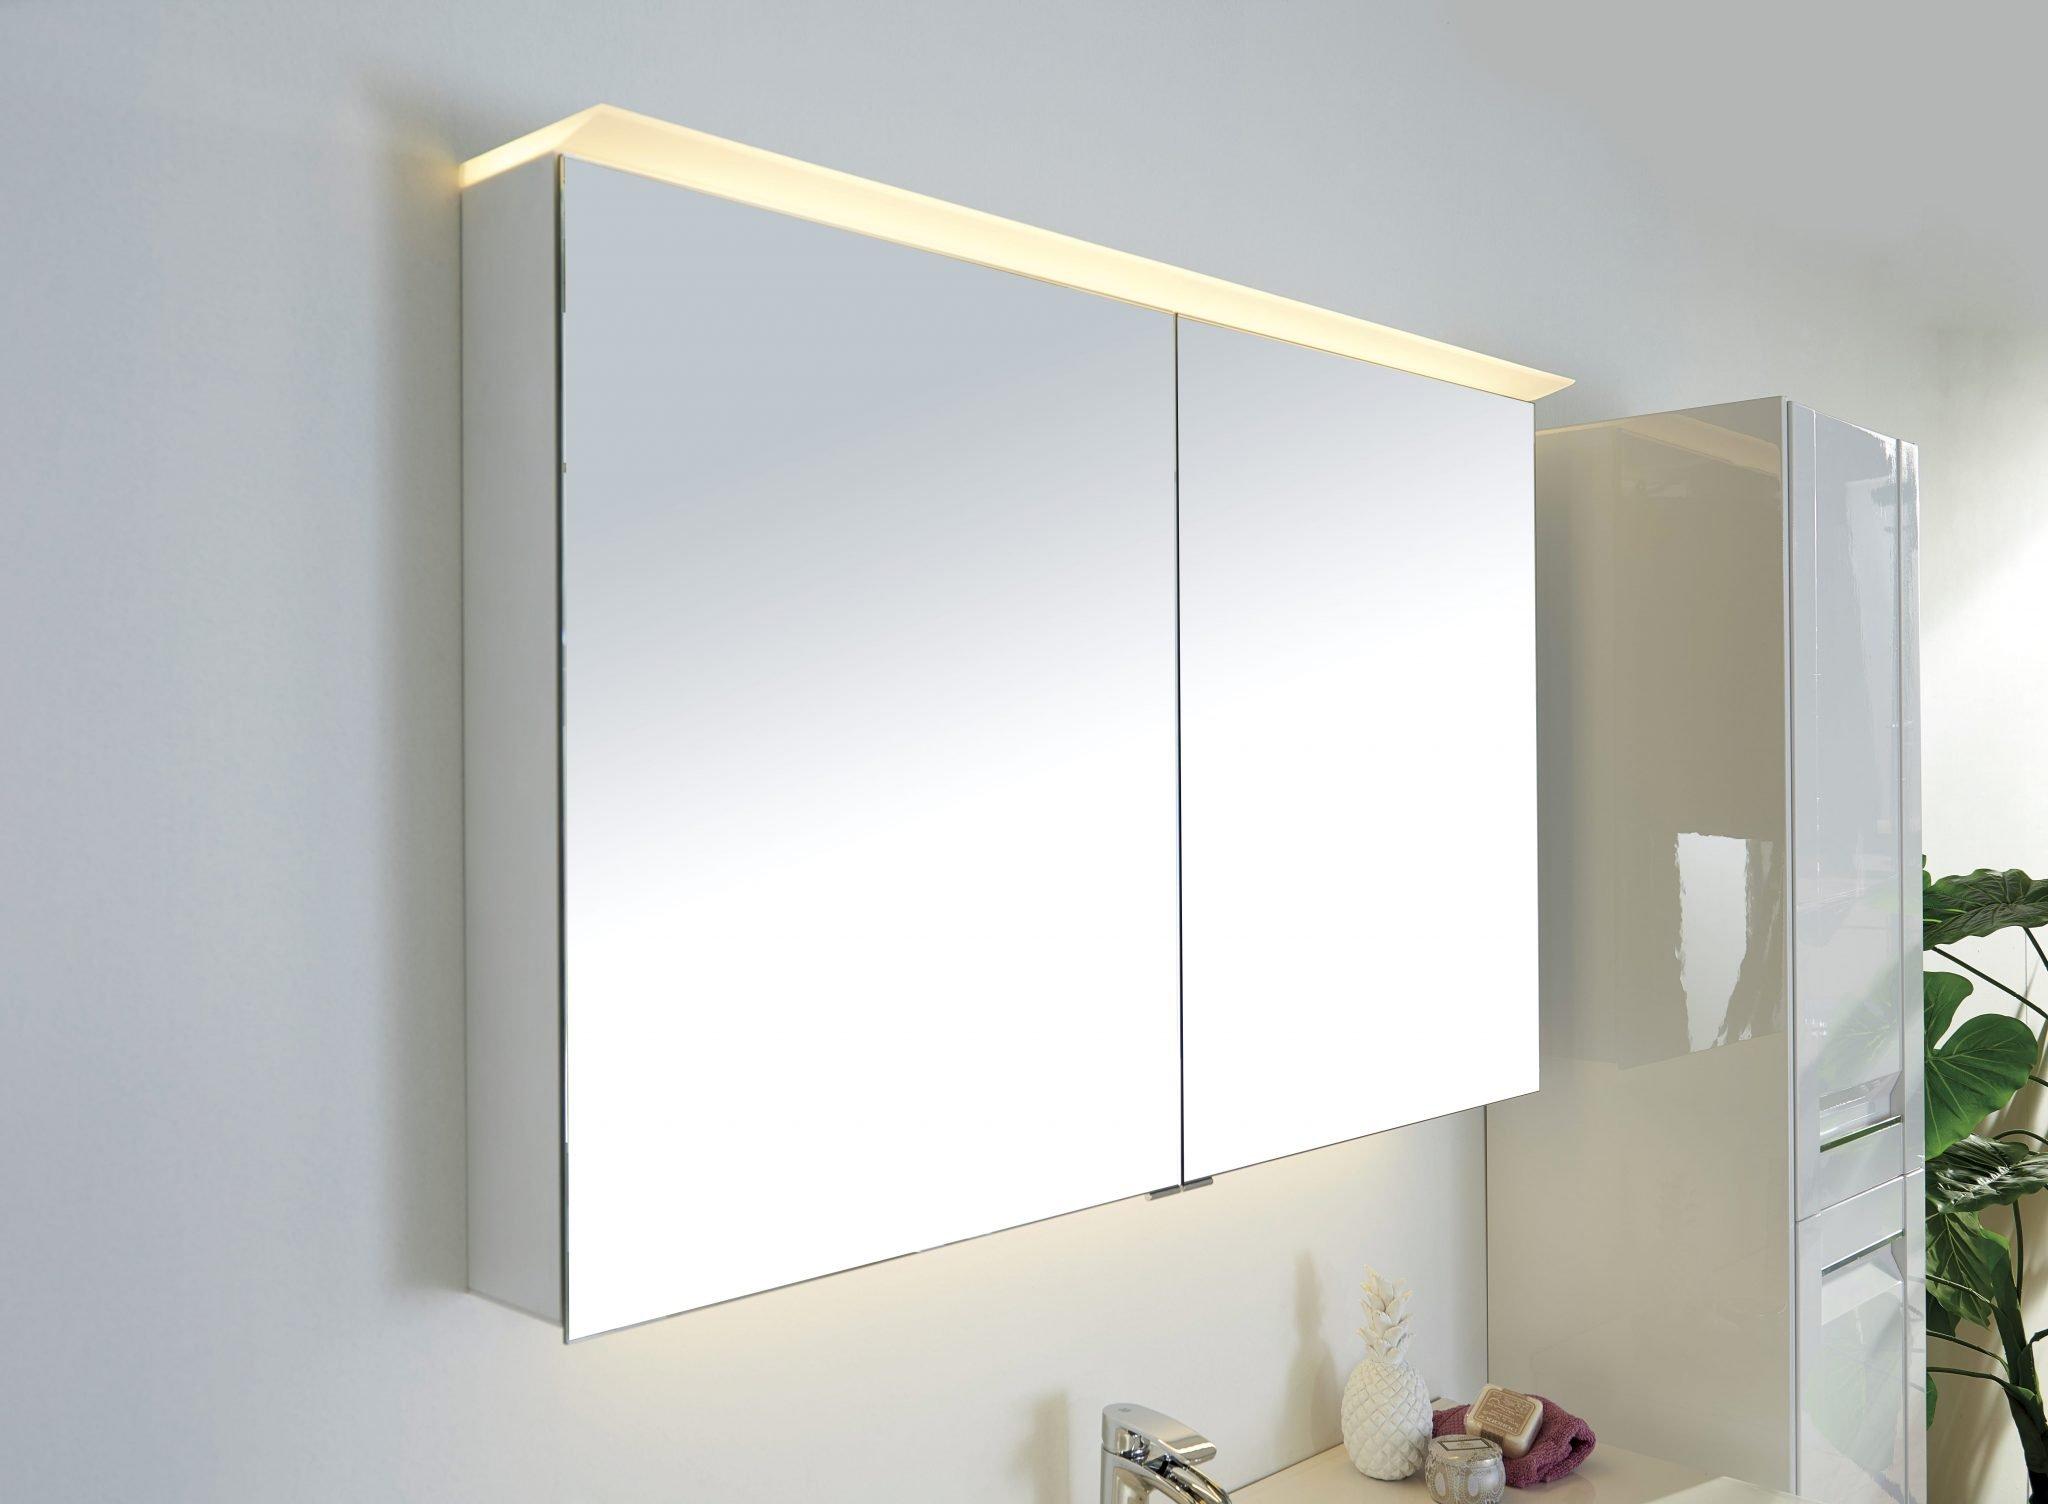 Veneto speilskap bilde 1